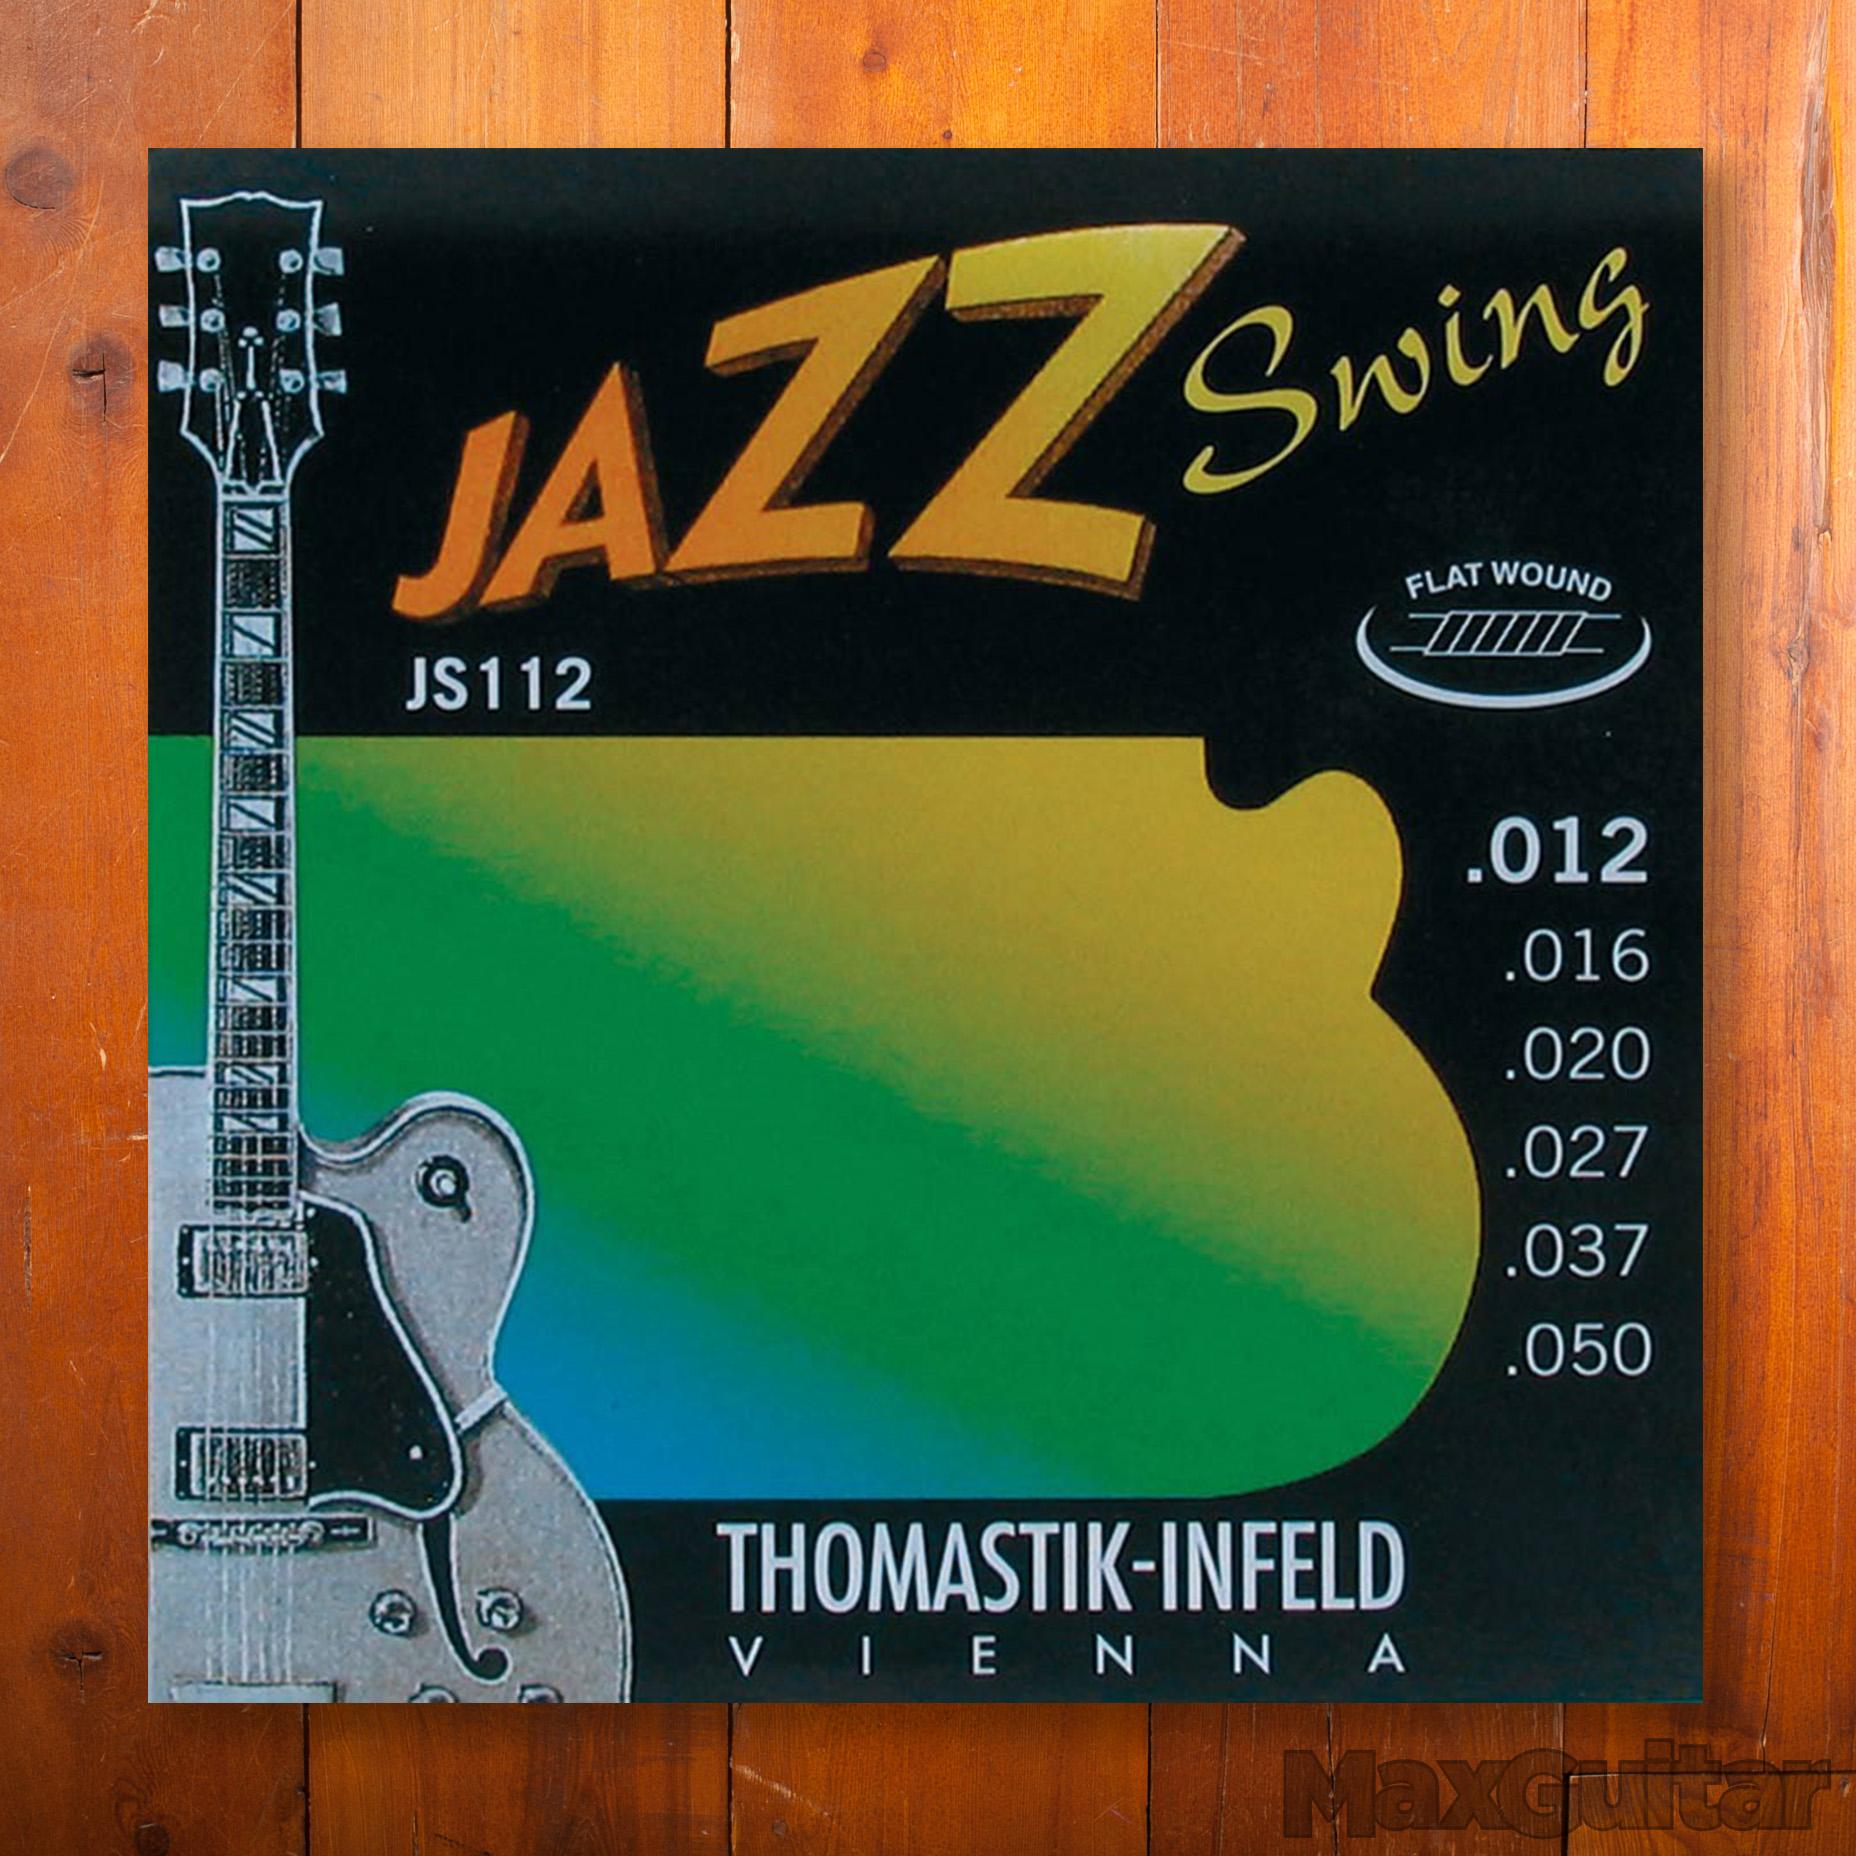 Thomastik-Infeld JS112 Jazz Swing Flatwound Medium Light